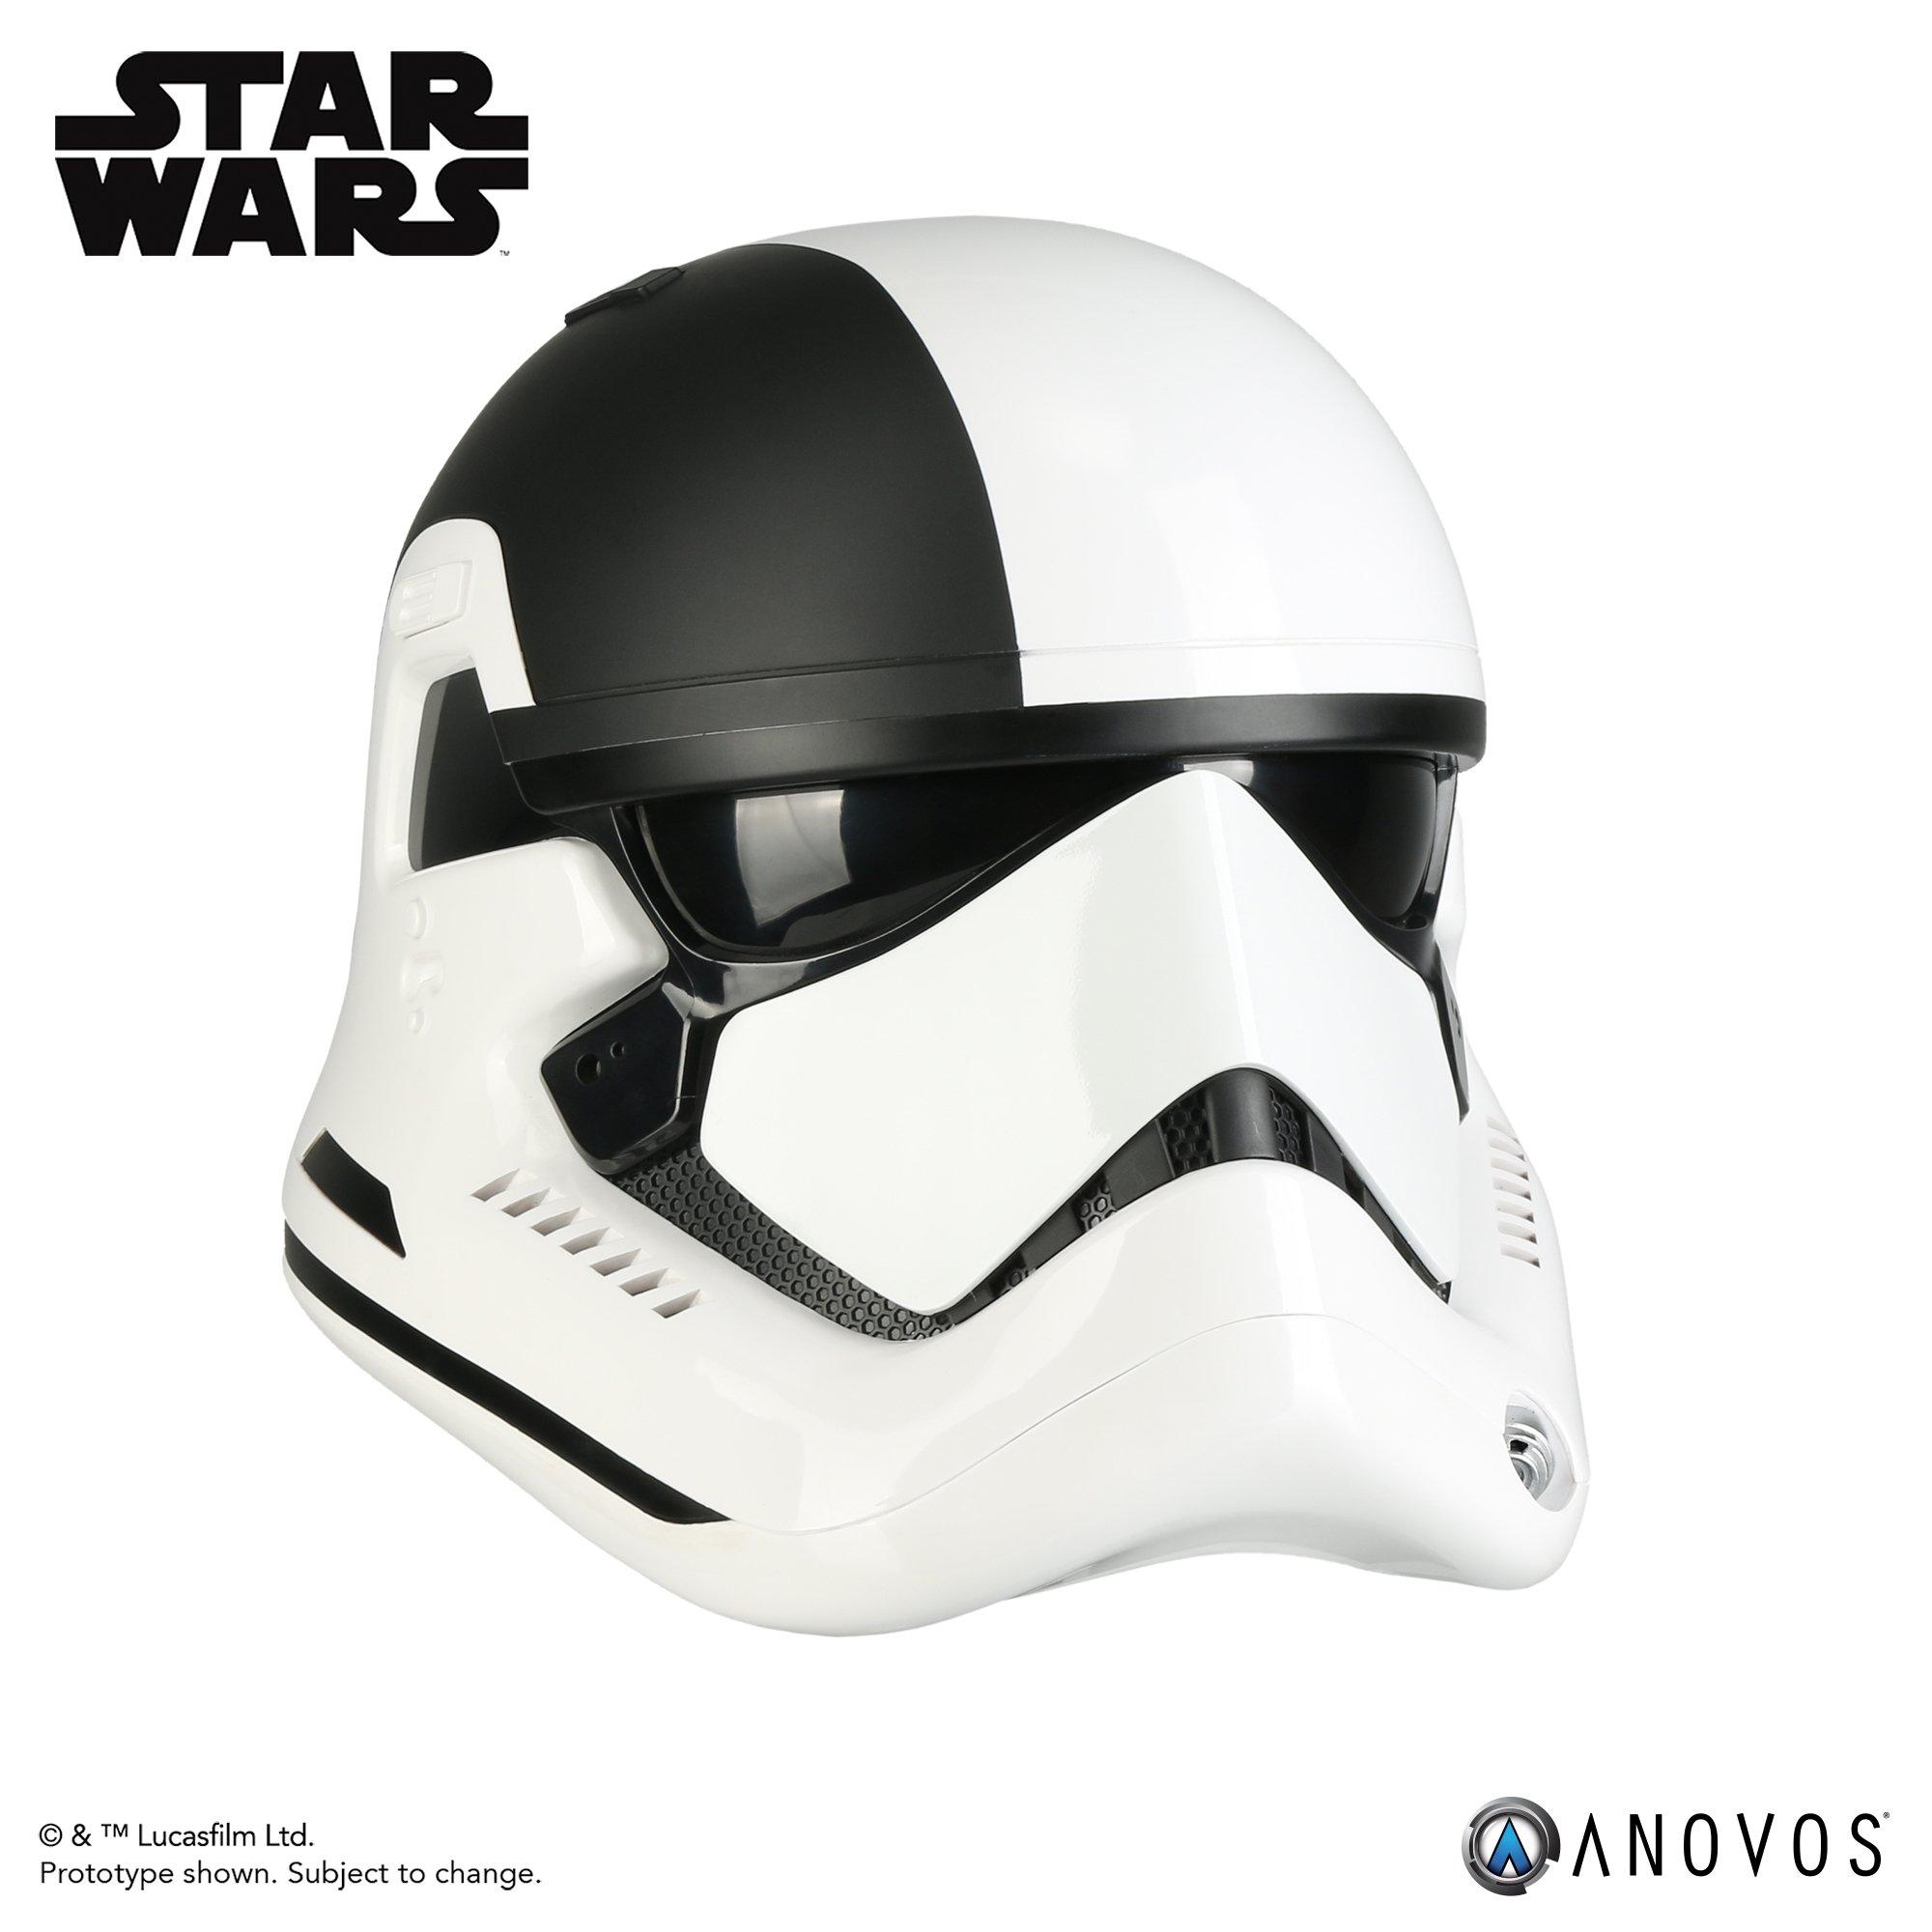 szmk_star_wars_csillagok_haboruja_last_jedi_utolso_jedik_helmet_sisak_6.jpg